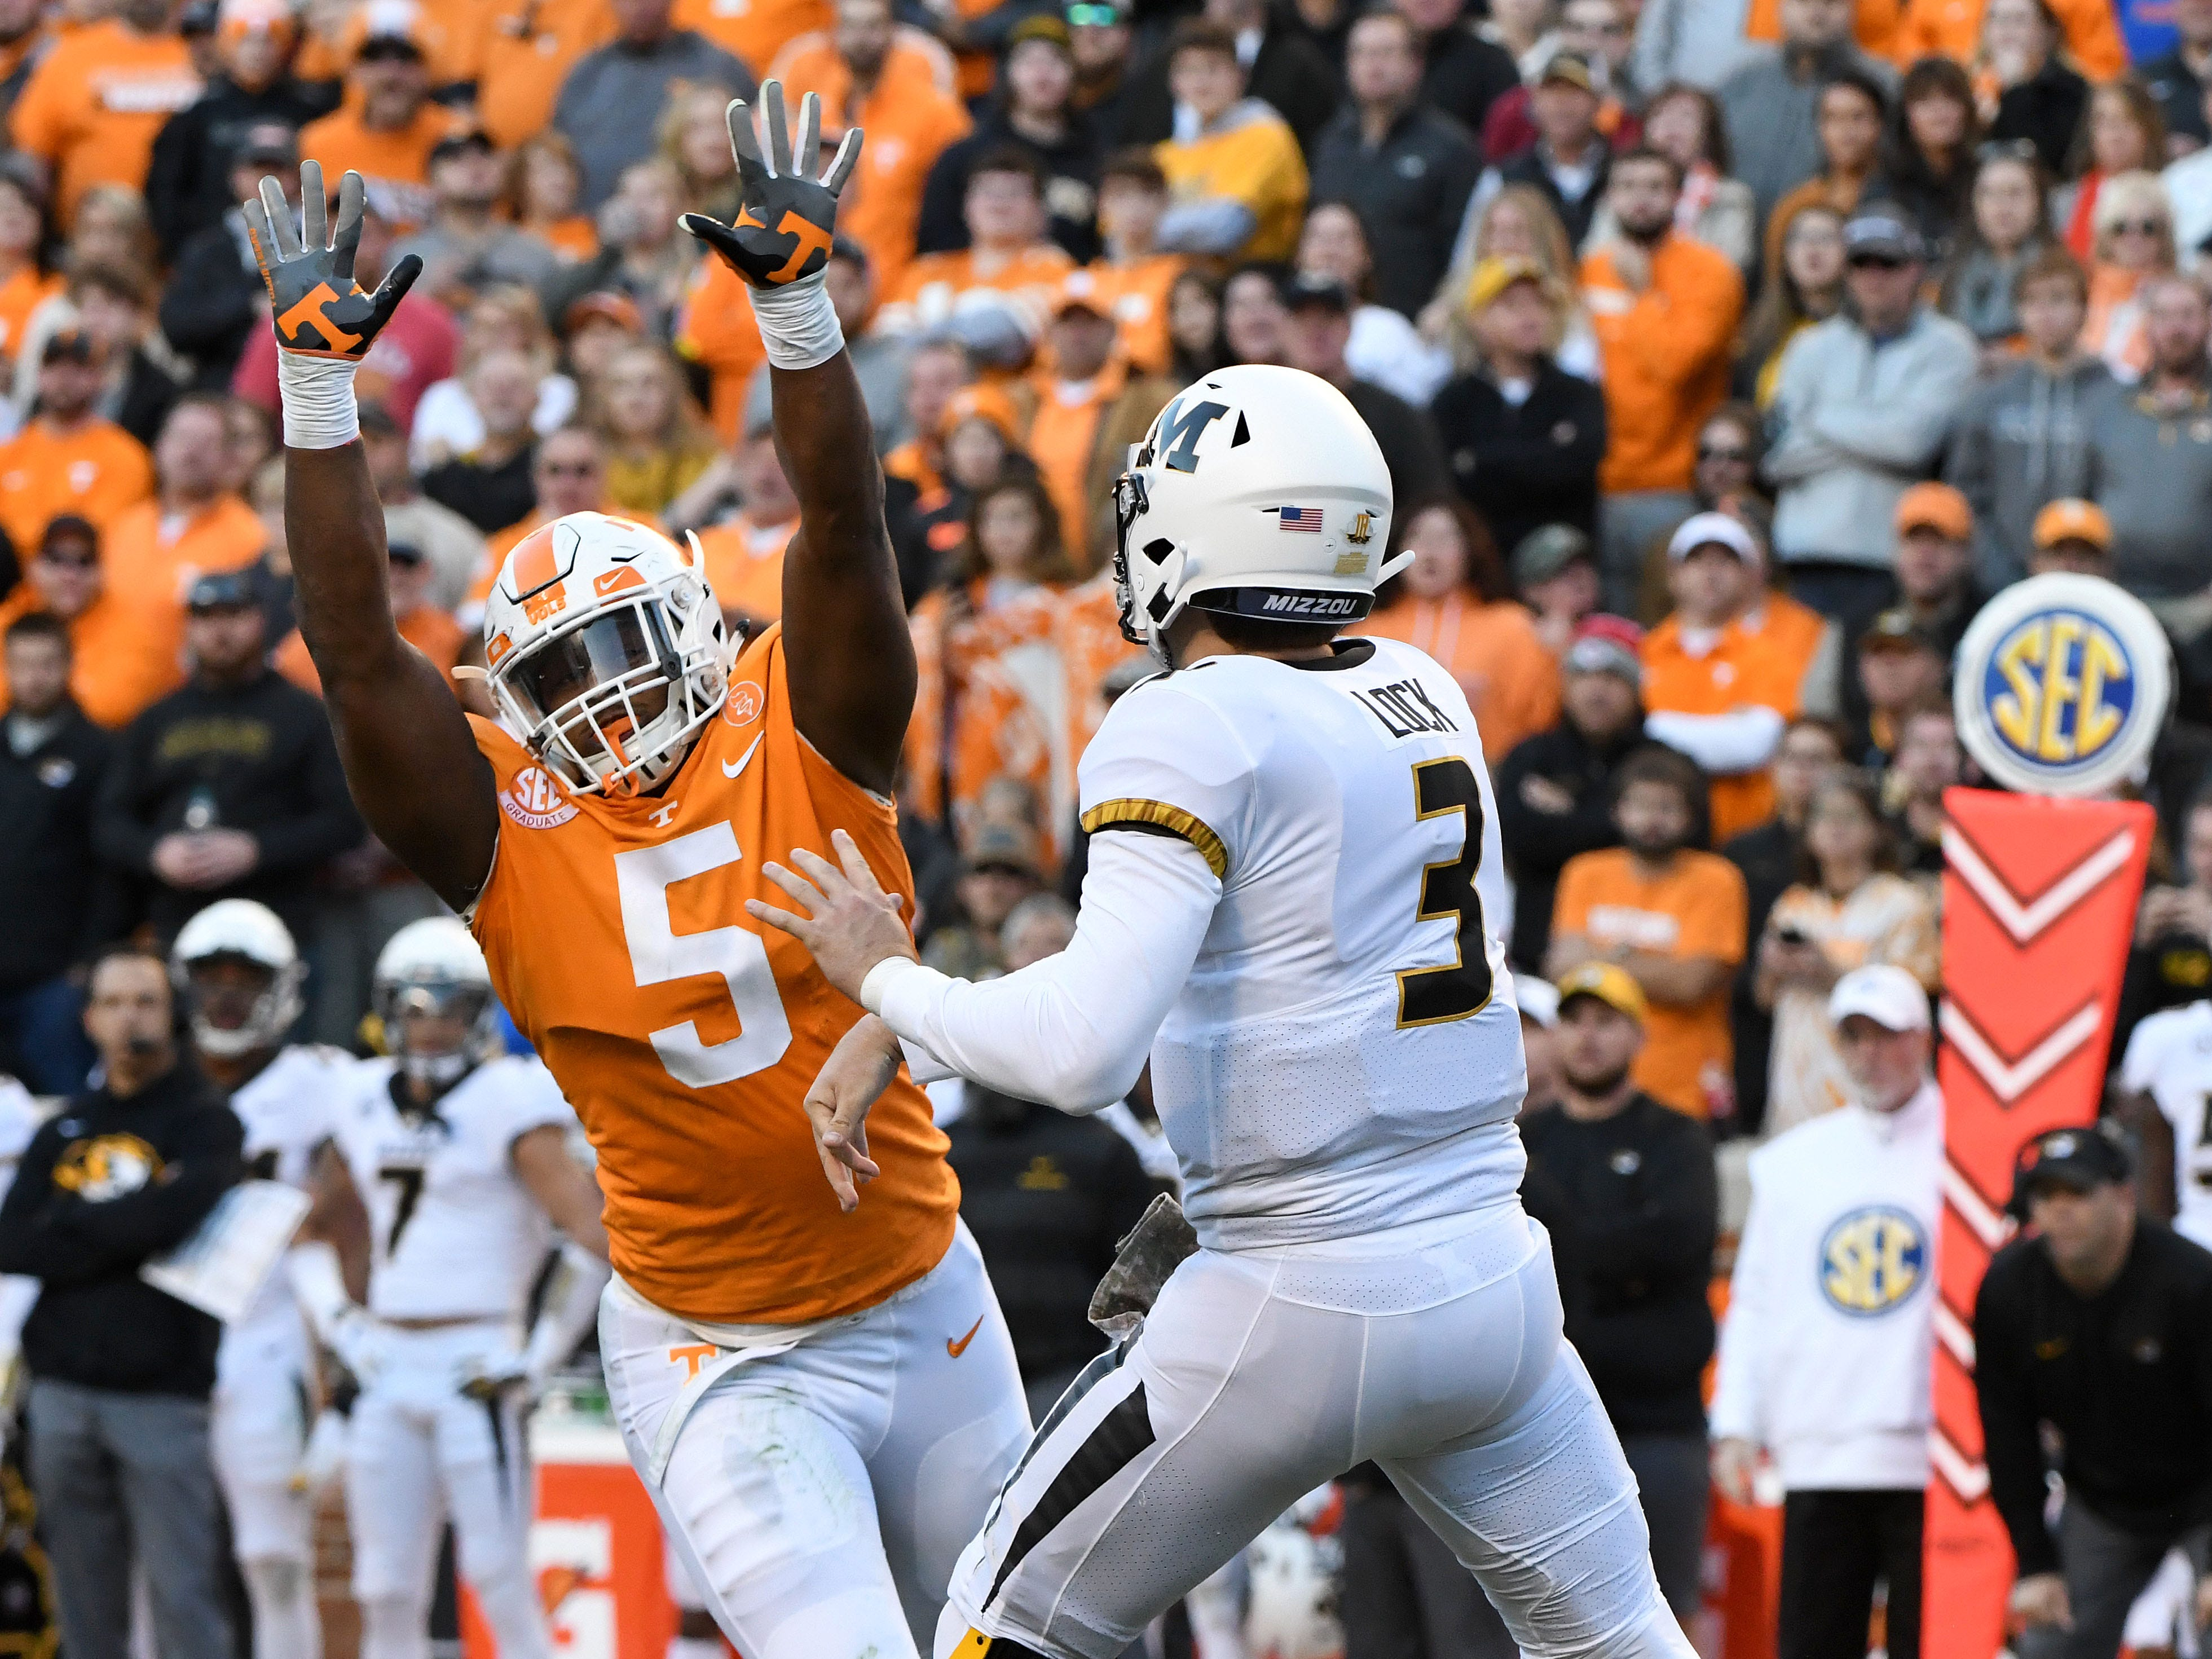 Tennessee defensive lineman Kyle Phillips (5) attacks Missouri quarterback Drew Lock (3) during first half action against Missouri Saturday, Nov. 17, 2018 at Neyland Stadium in Knoxville, Tenn.